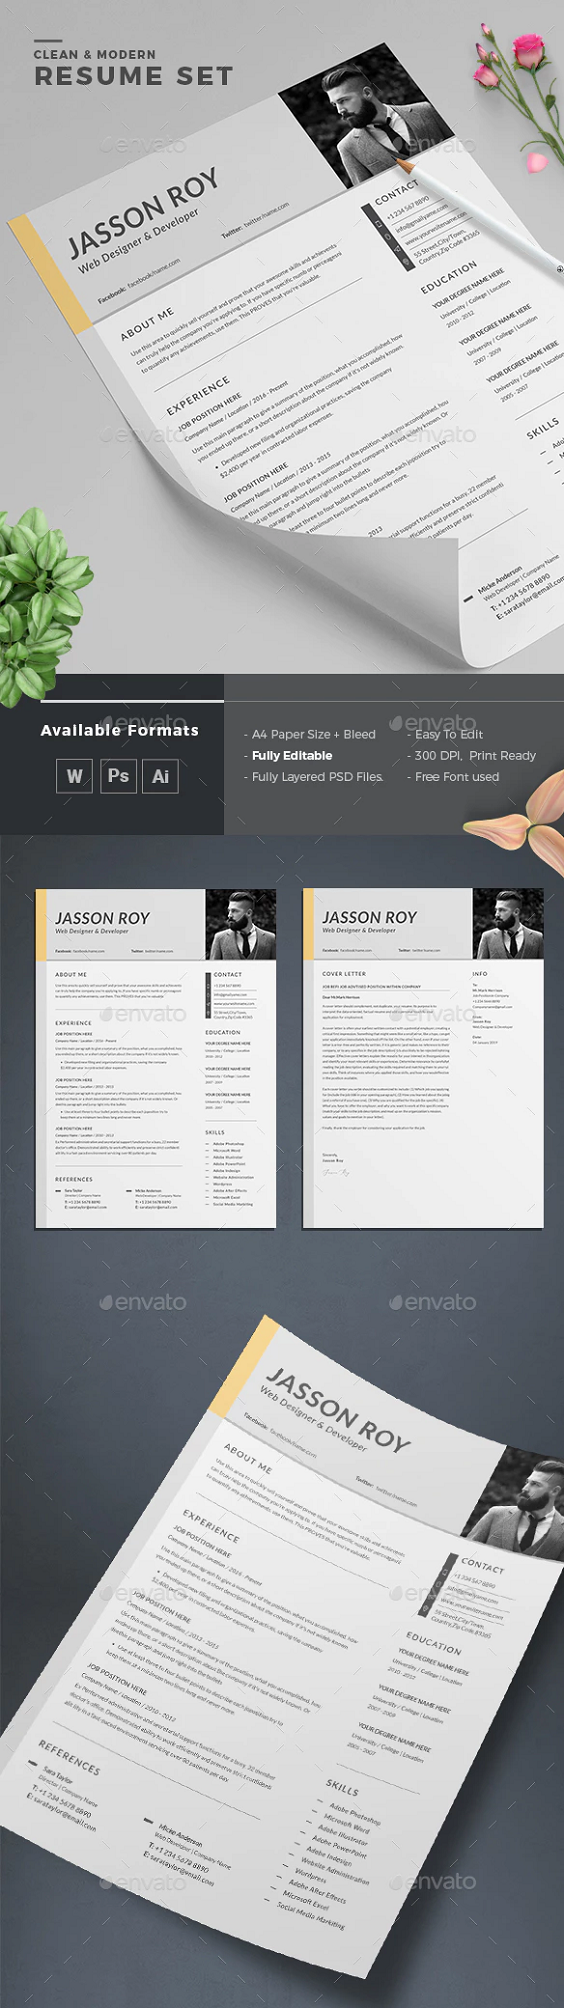 Cv Template For Word Resume design free, Resume design